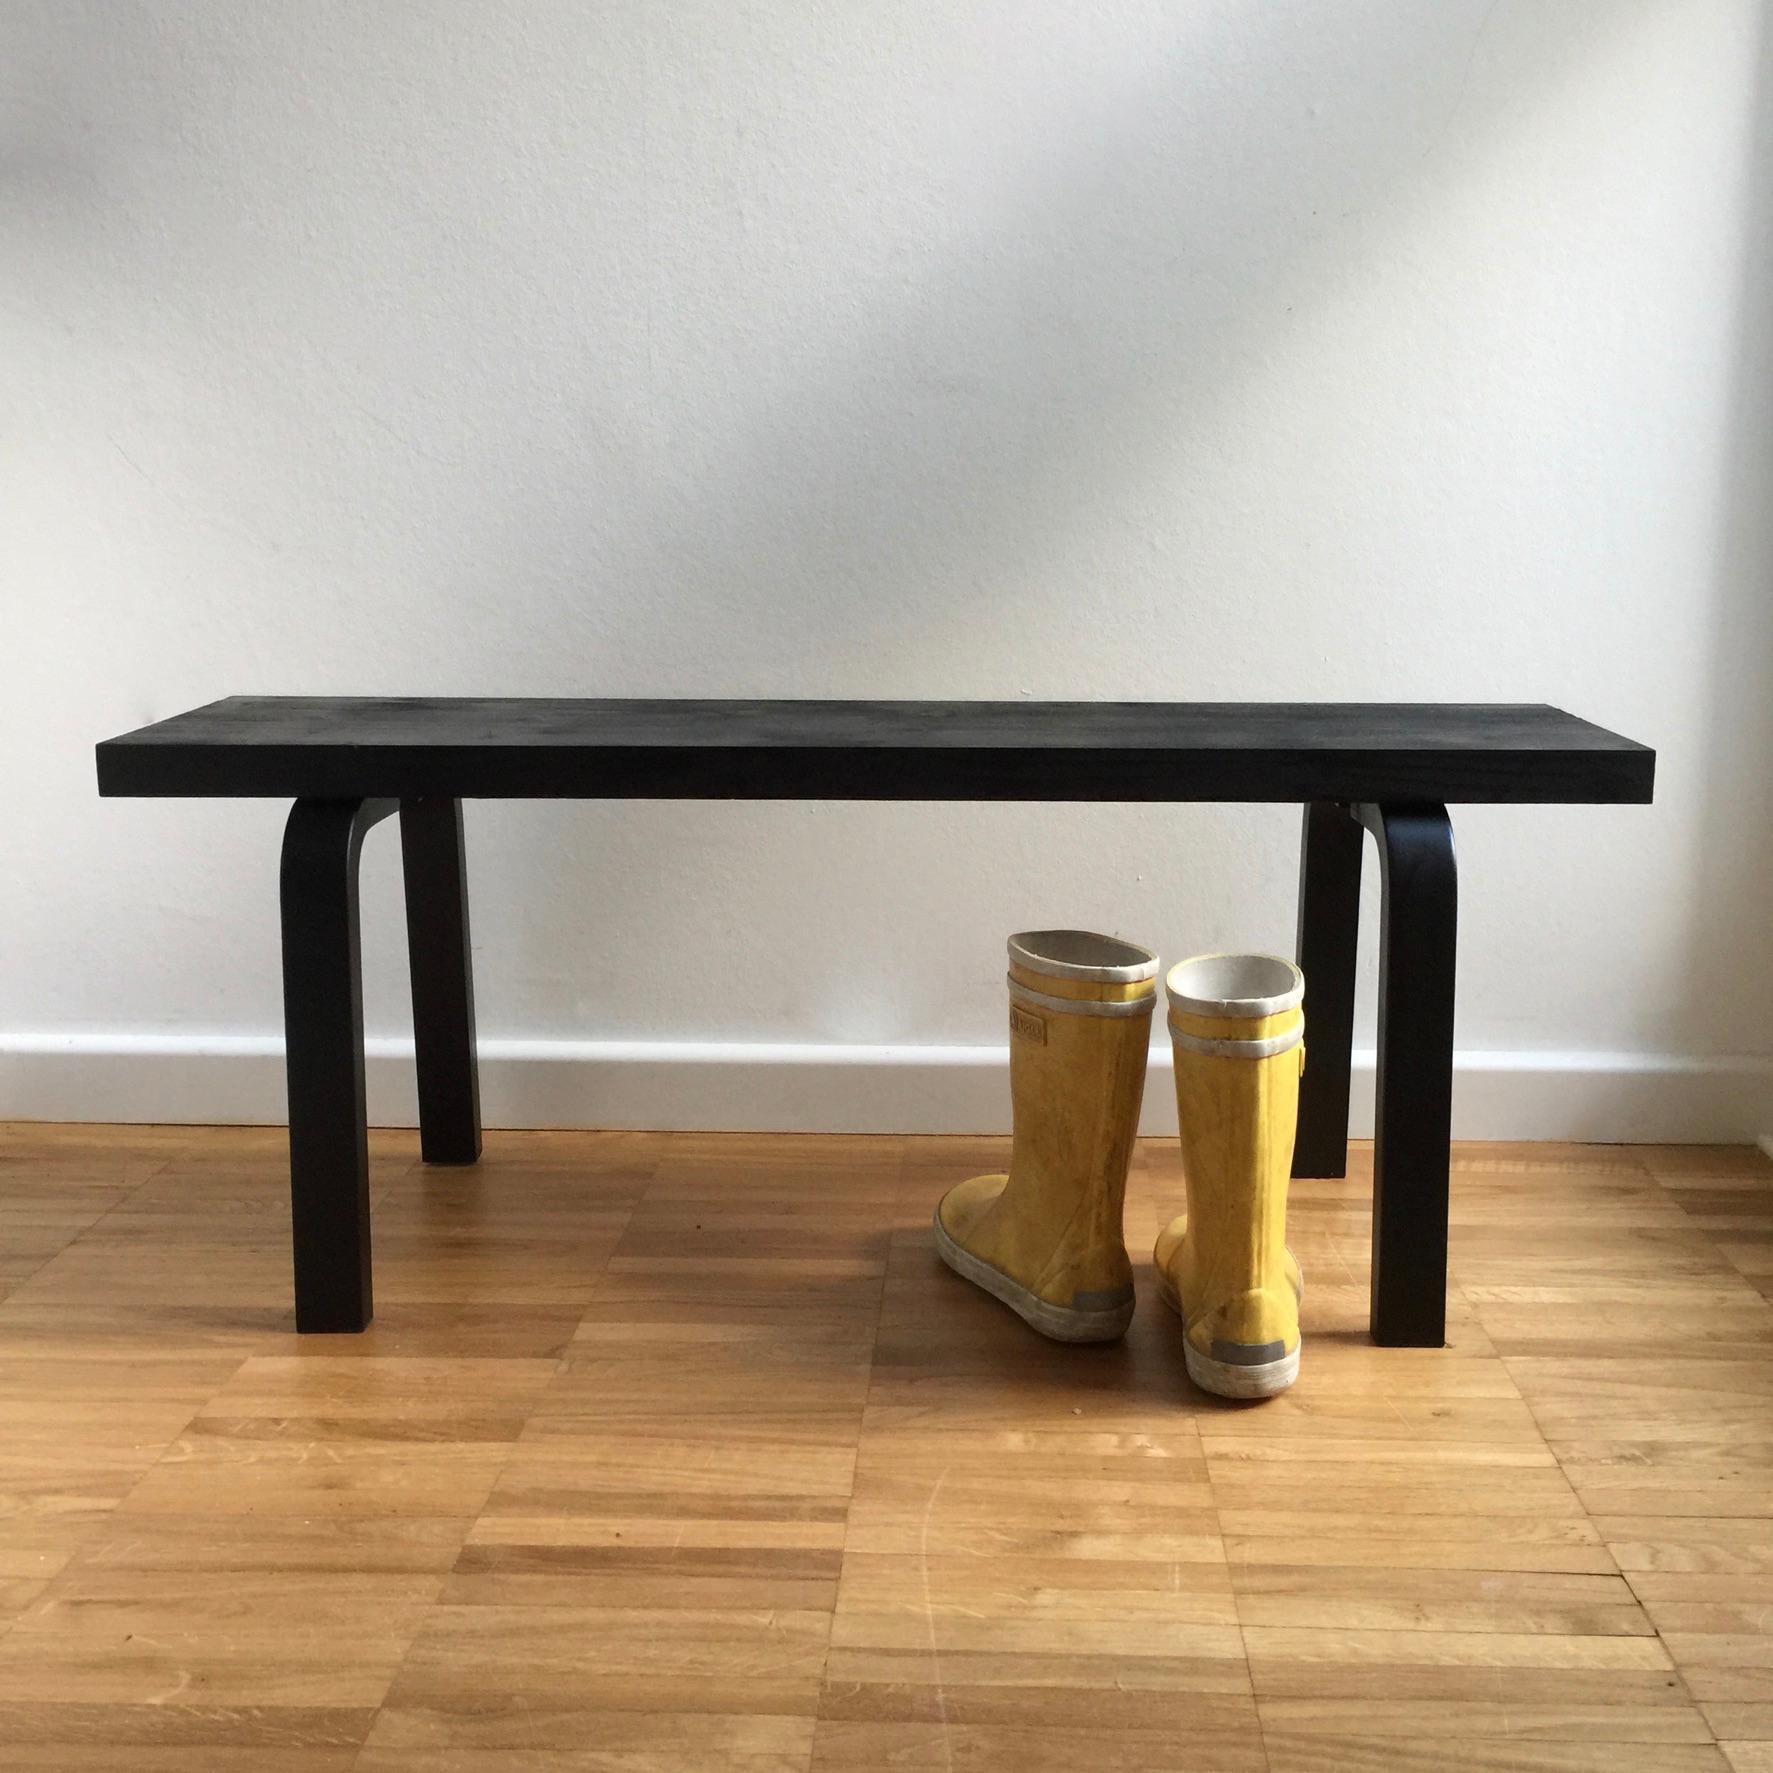 Sitzbank-Ideen: So setzt du das Möbelstück in Szene!